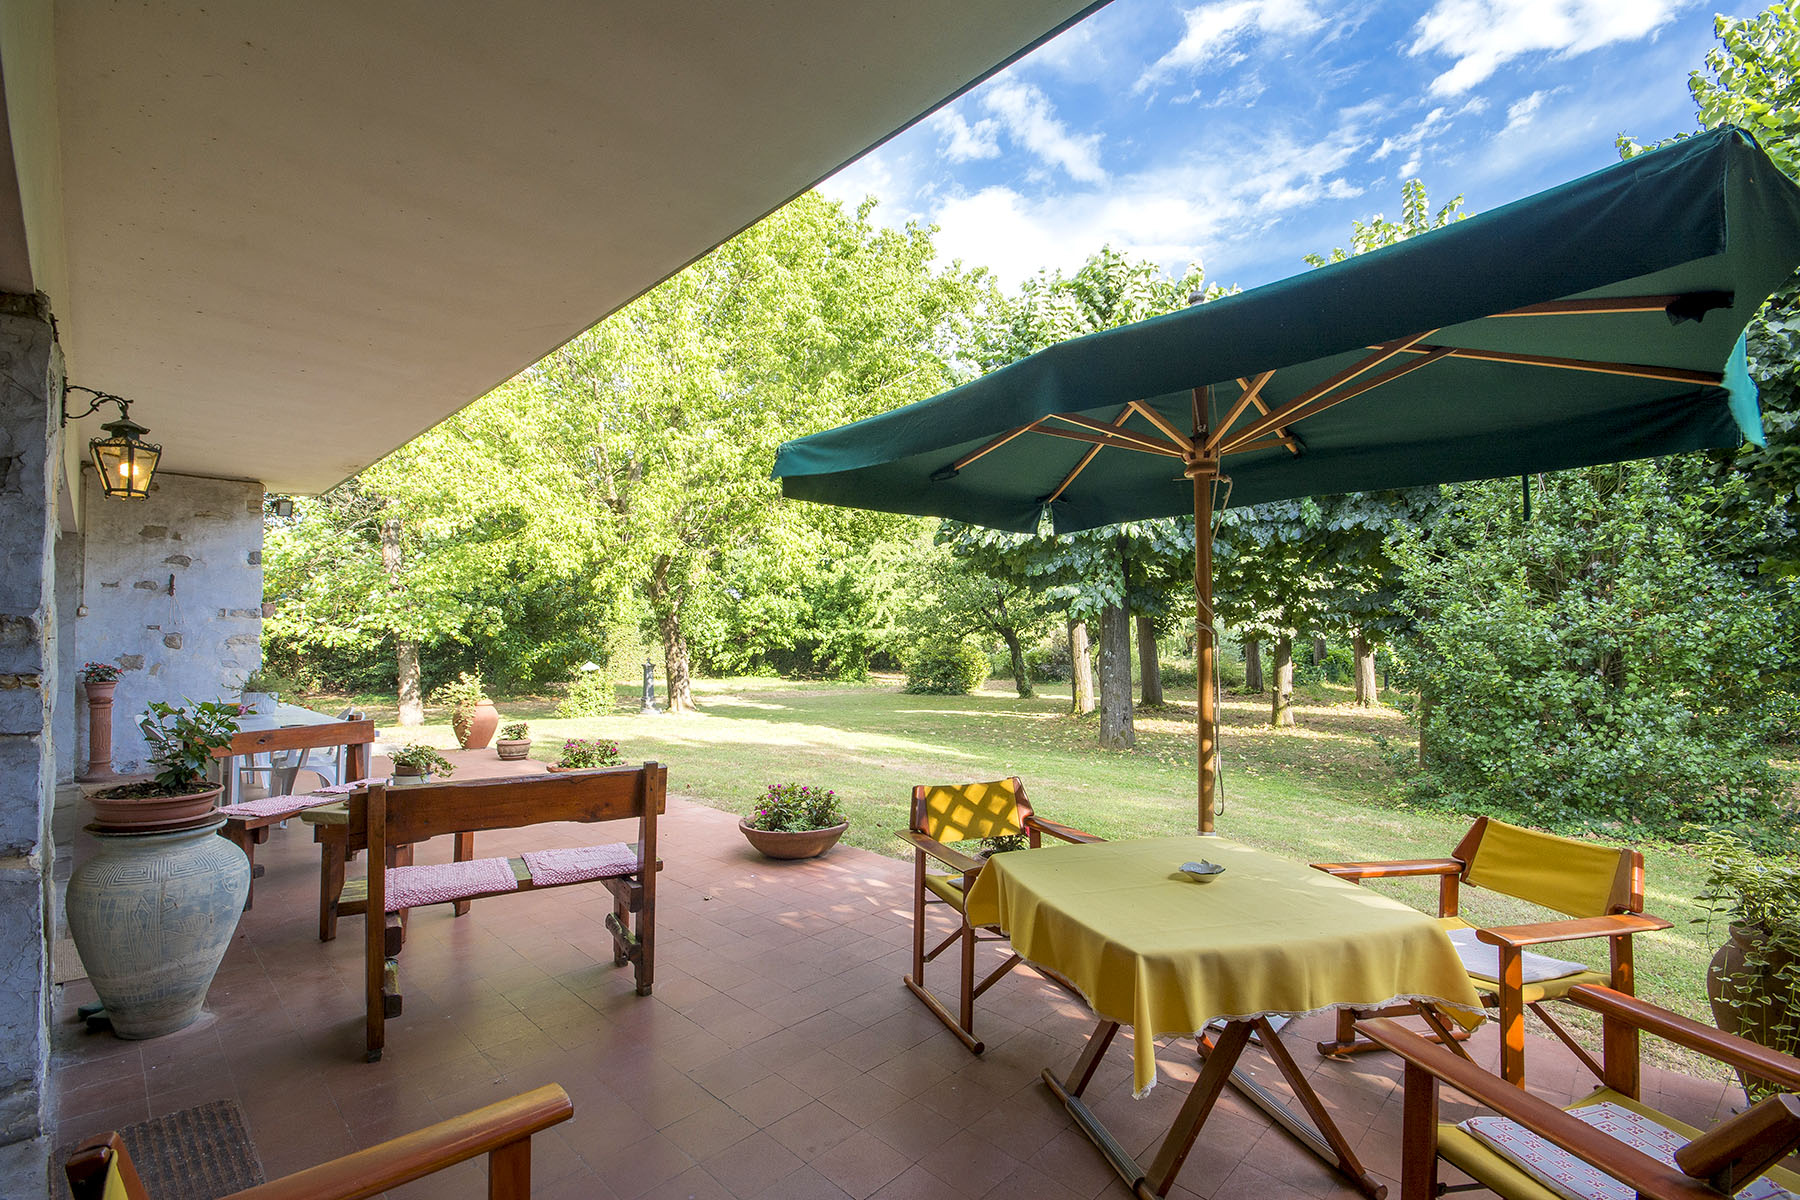 Villa in Vendita a Capannori: 5 locali, 500 mq - Foto 5